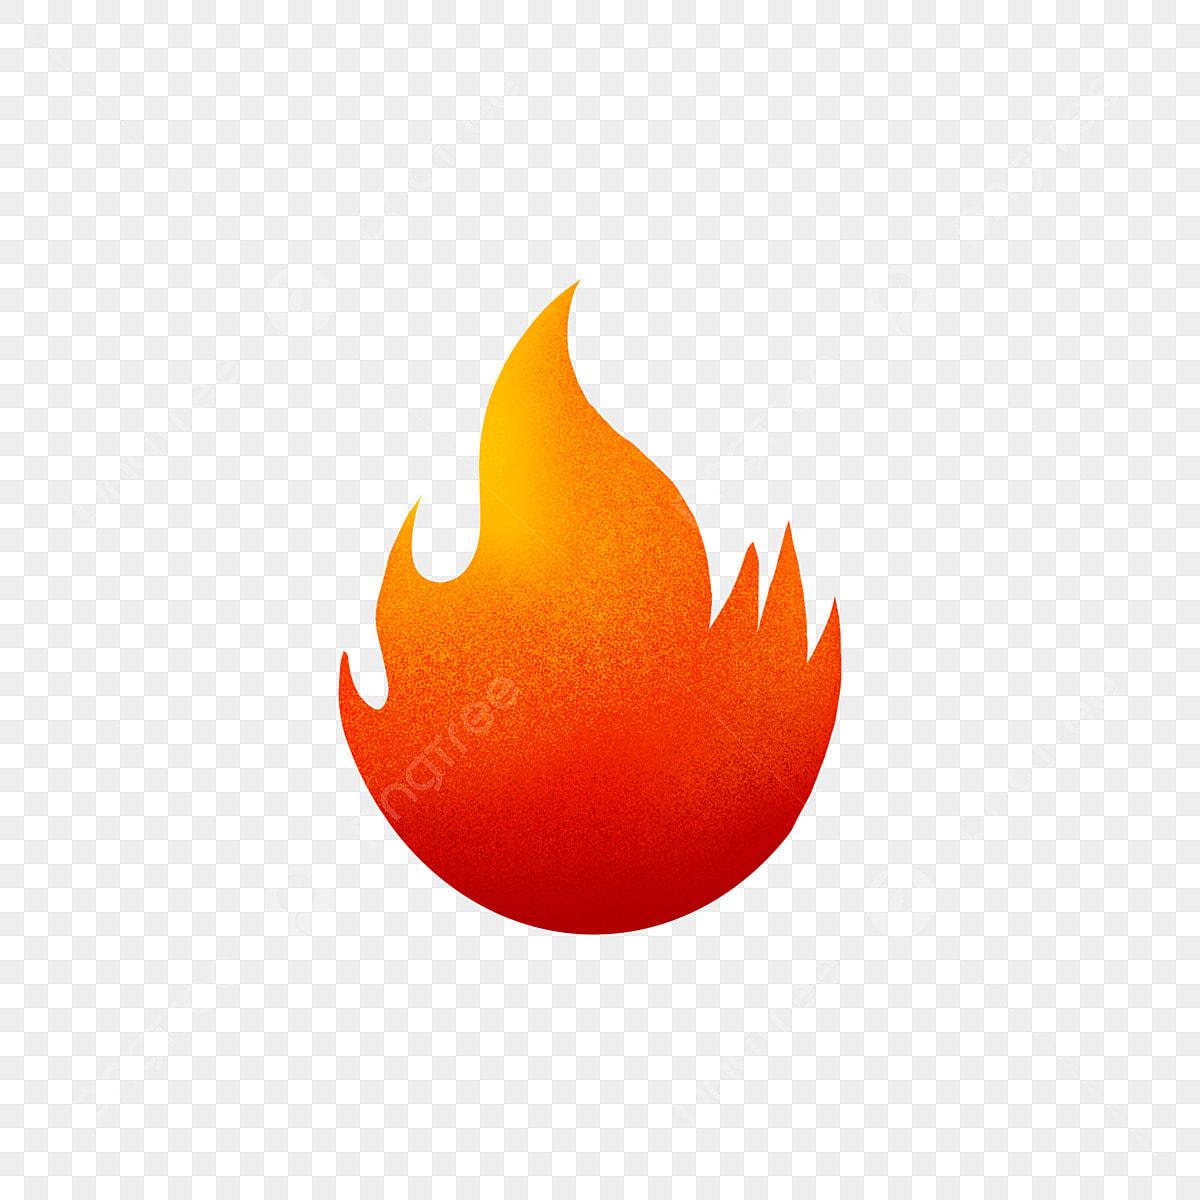 Bonfire PNG Image | Egyptian crafts, Bonfire, Bonfire night guy fawkes